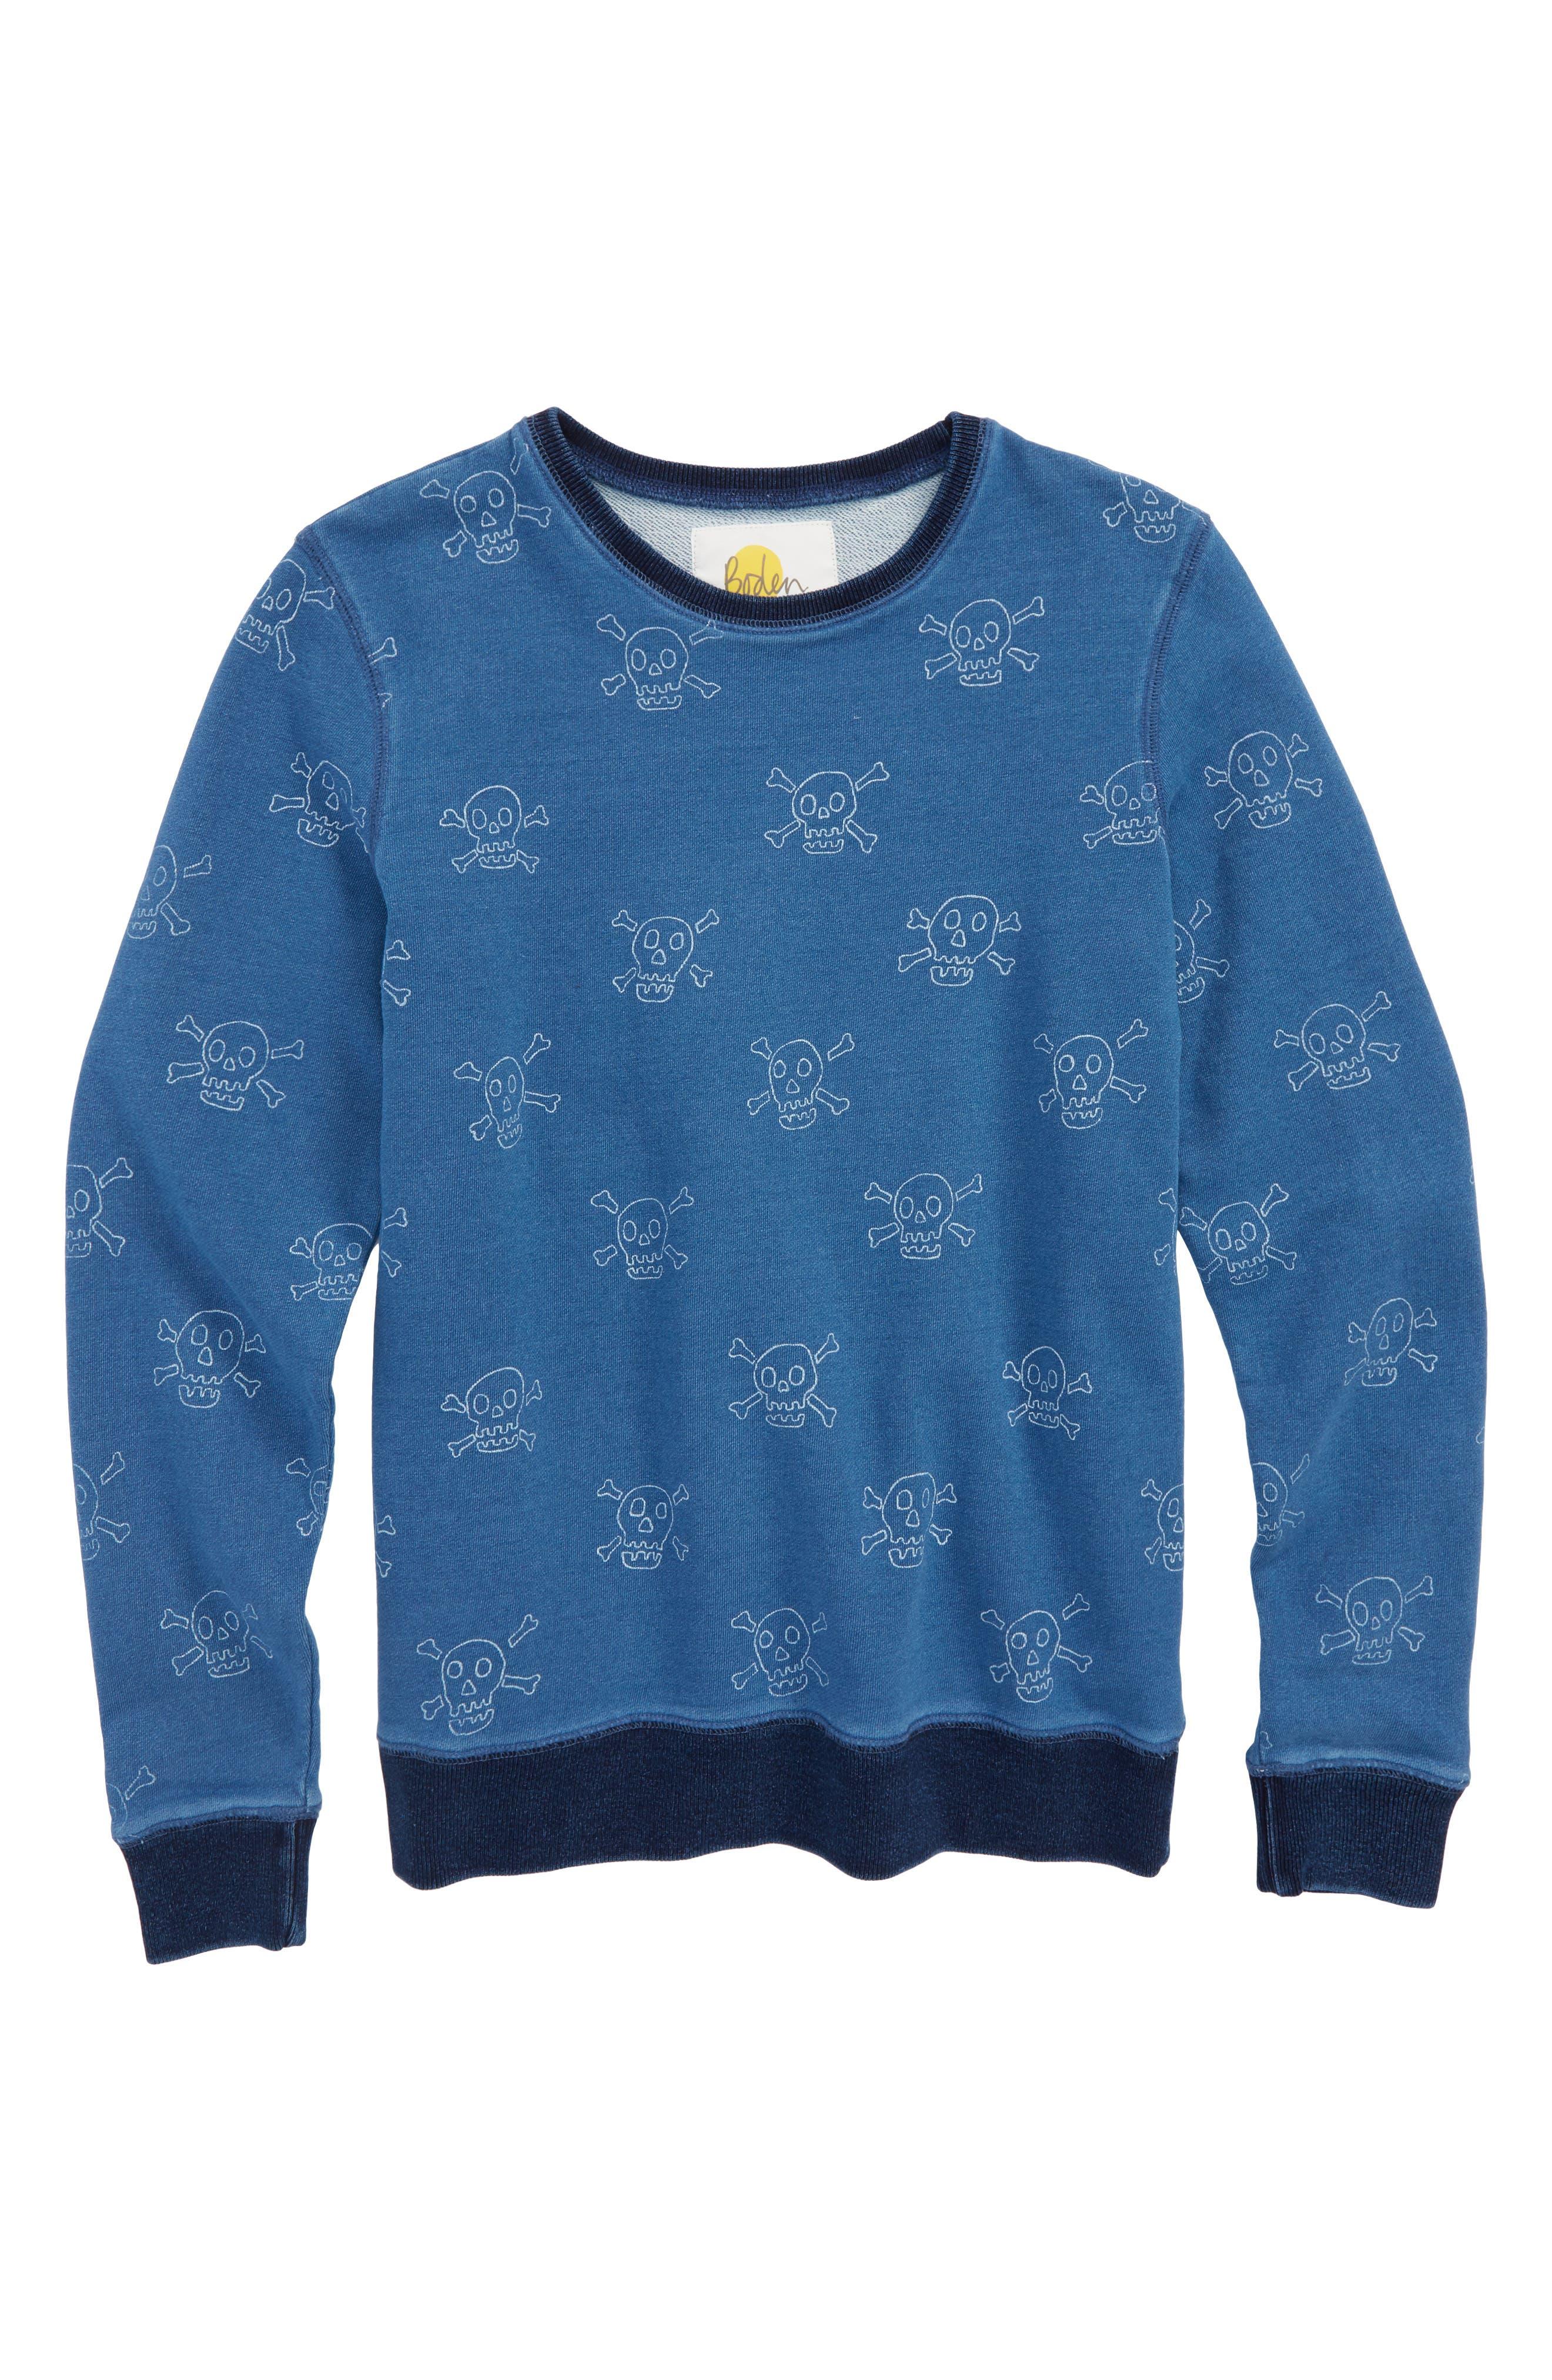 Castaway Skulls Sweatshirt,                             Main thumbnail 1, color,                             Mid Indigo Blue Skulls